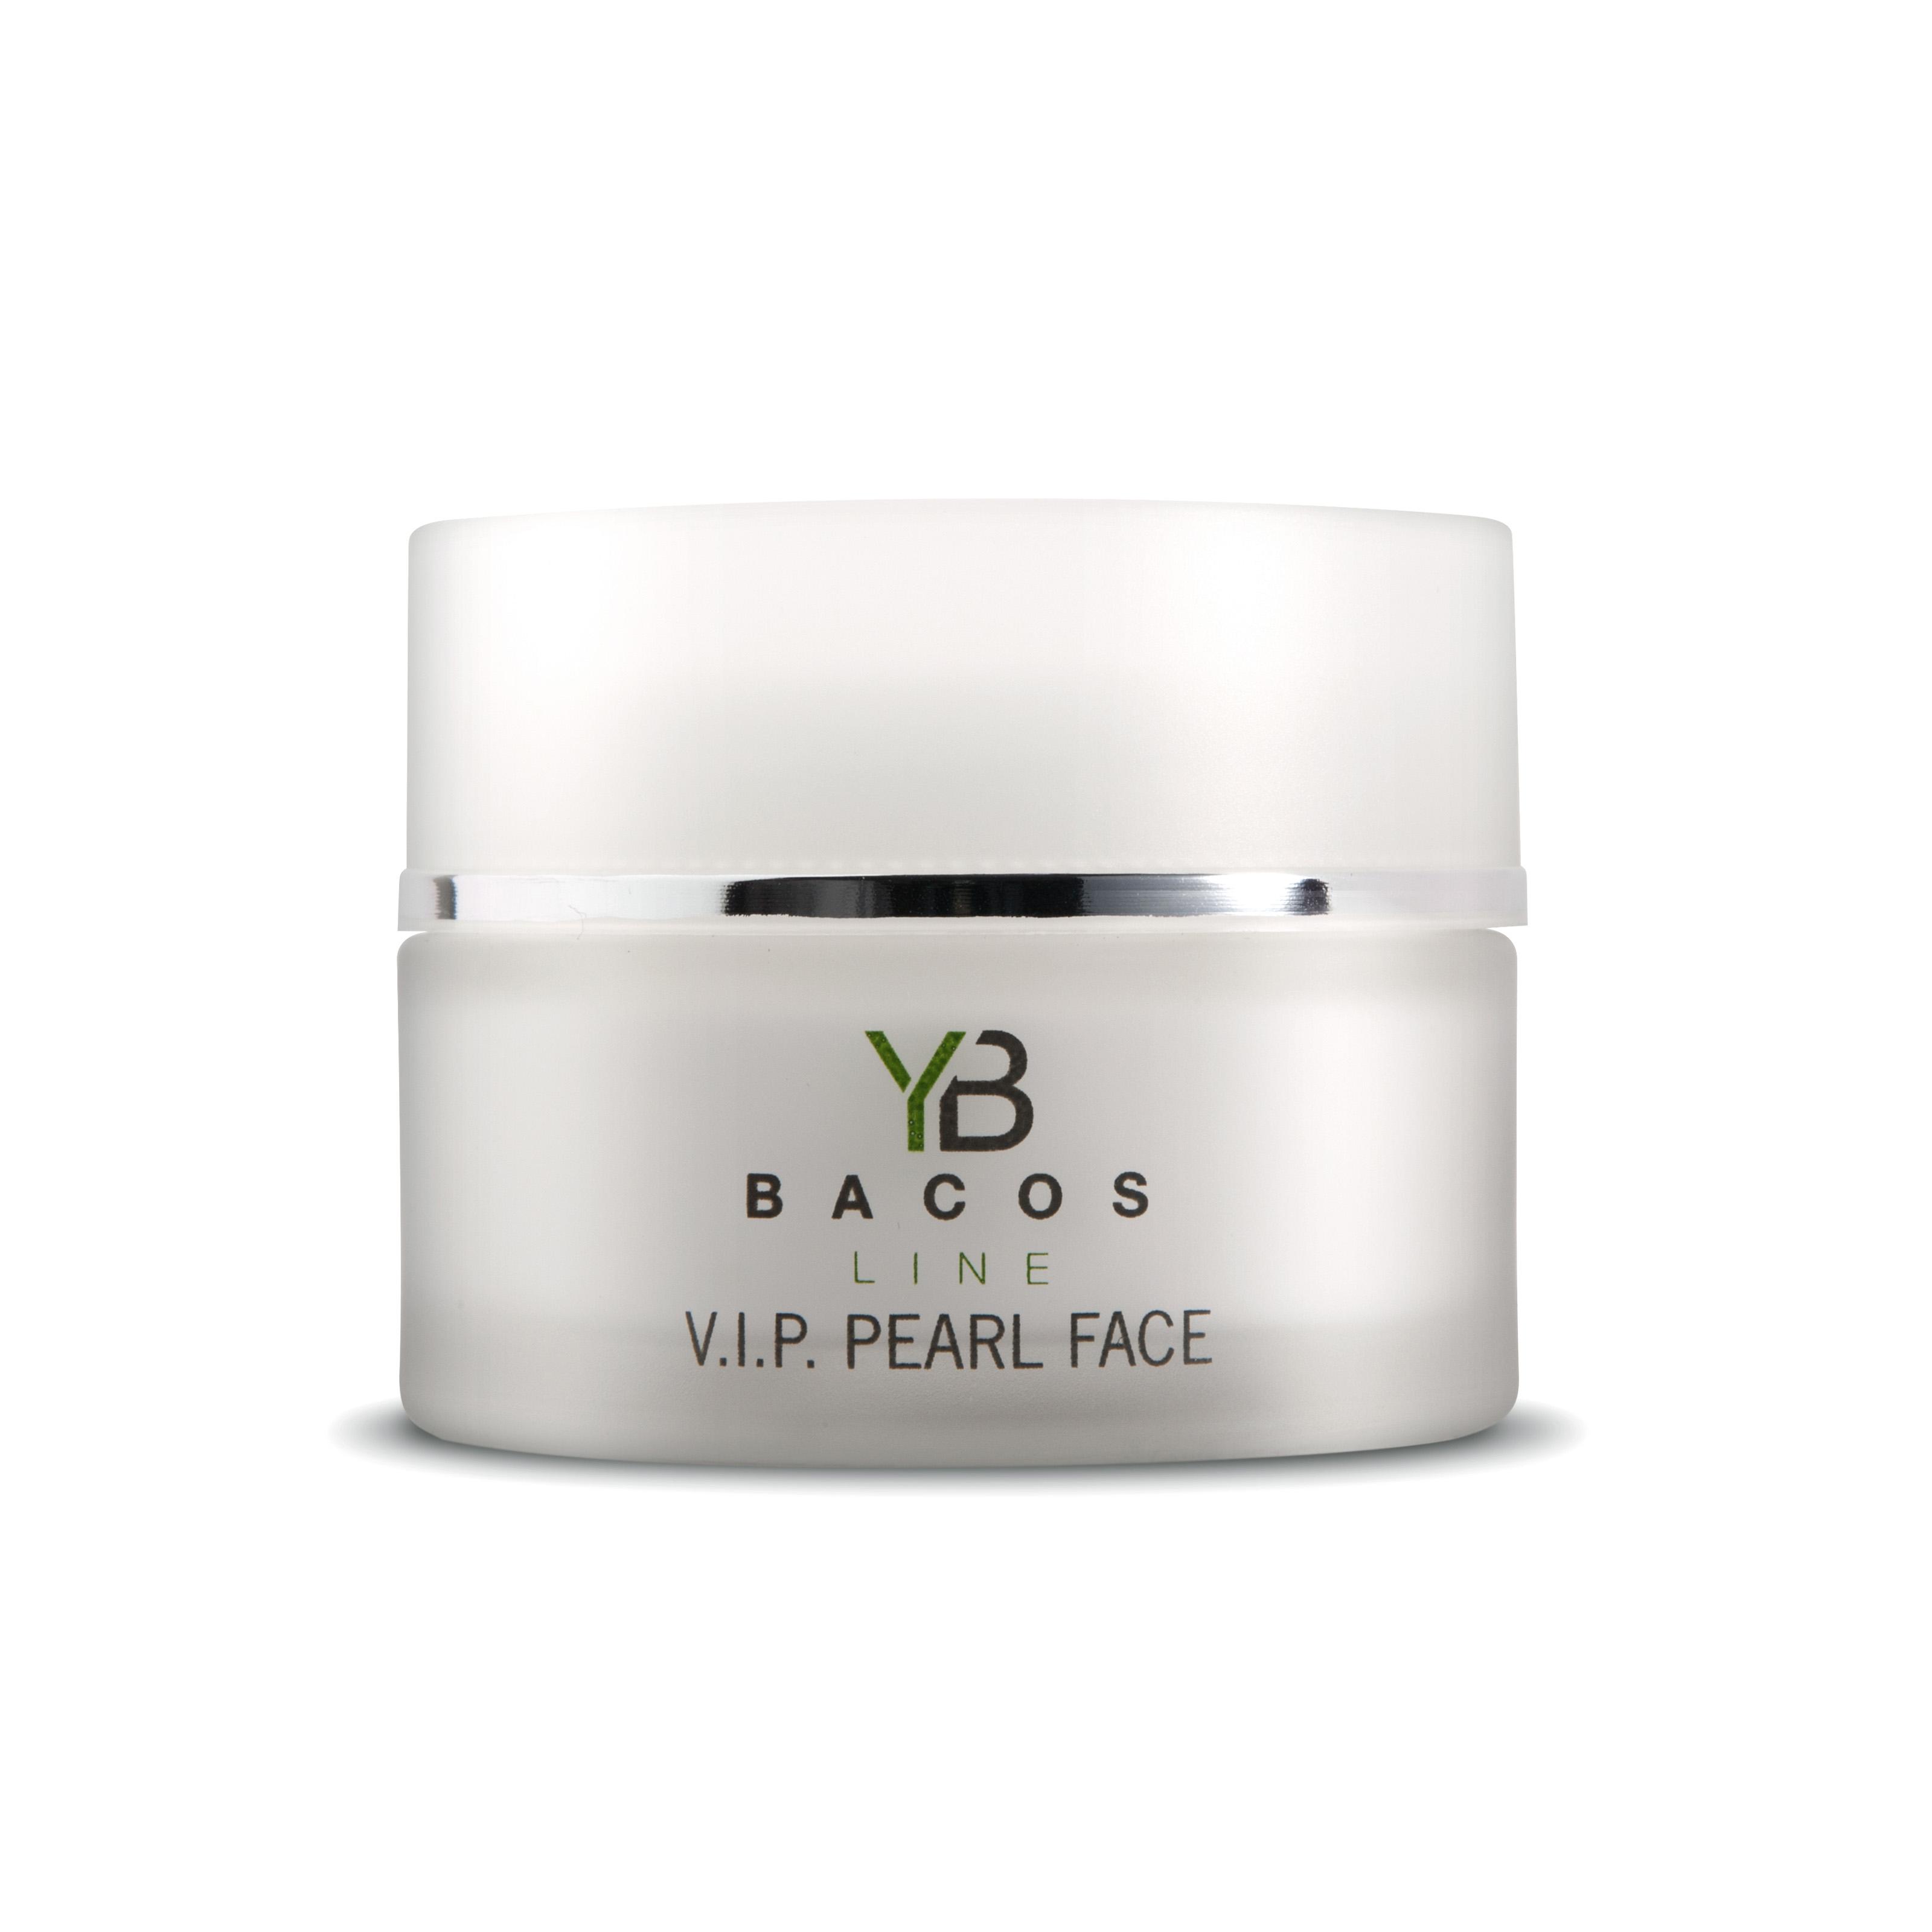 YB BACOS LINE V.I.P PEARL FACE CREAM - 50 ml